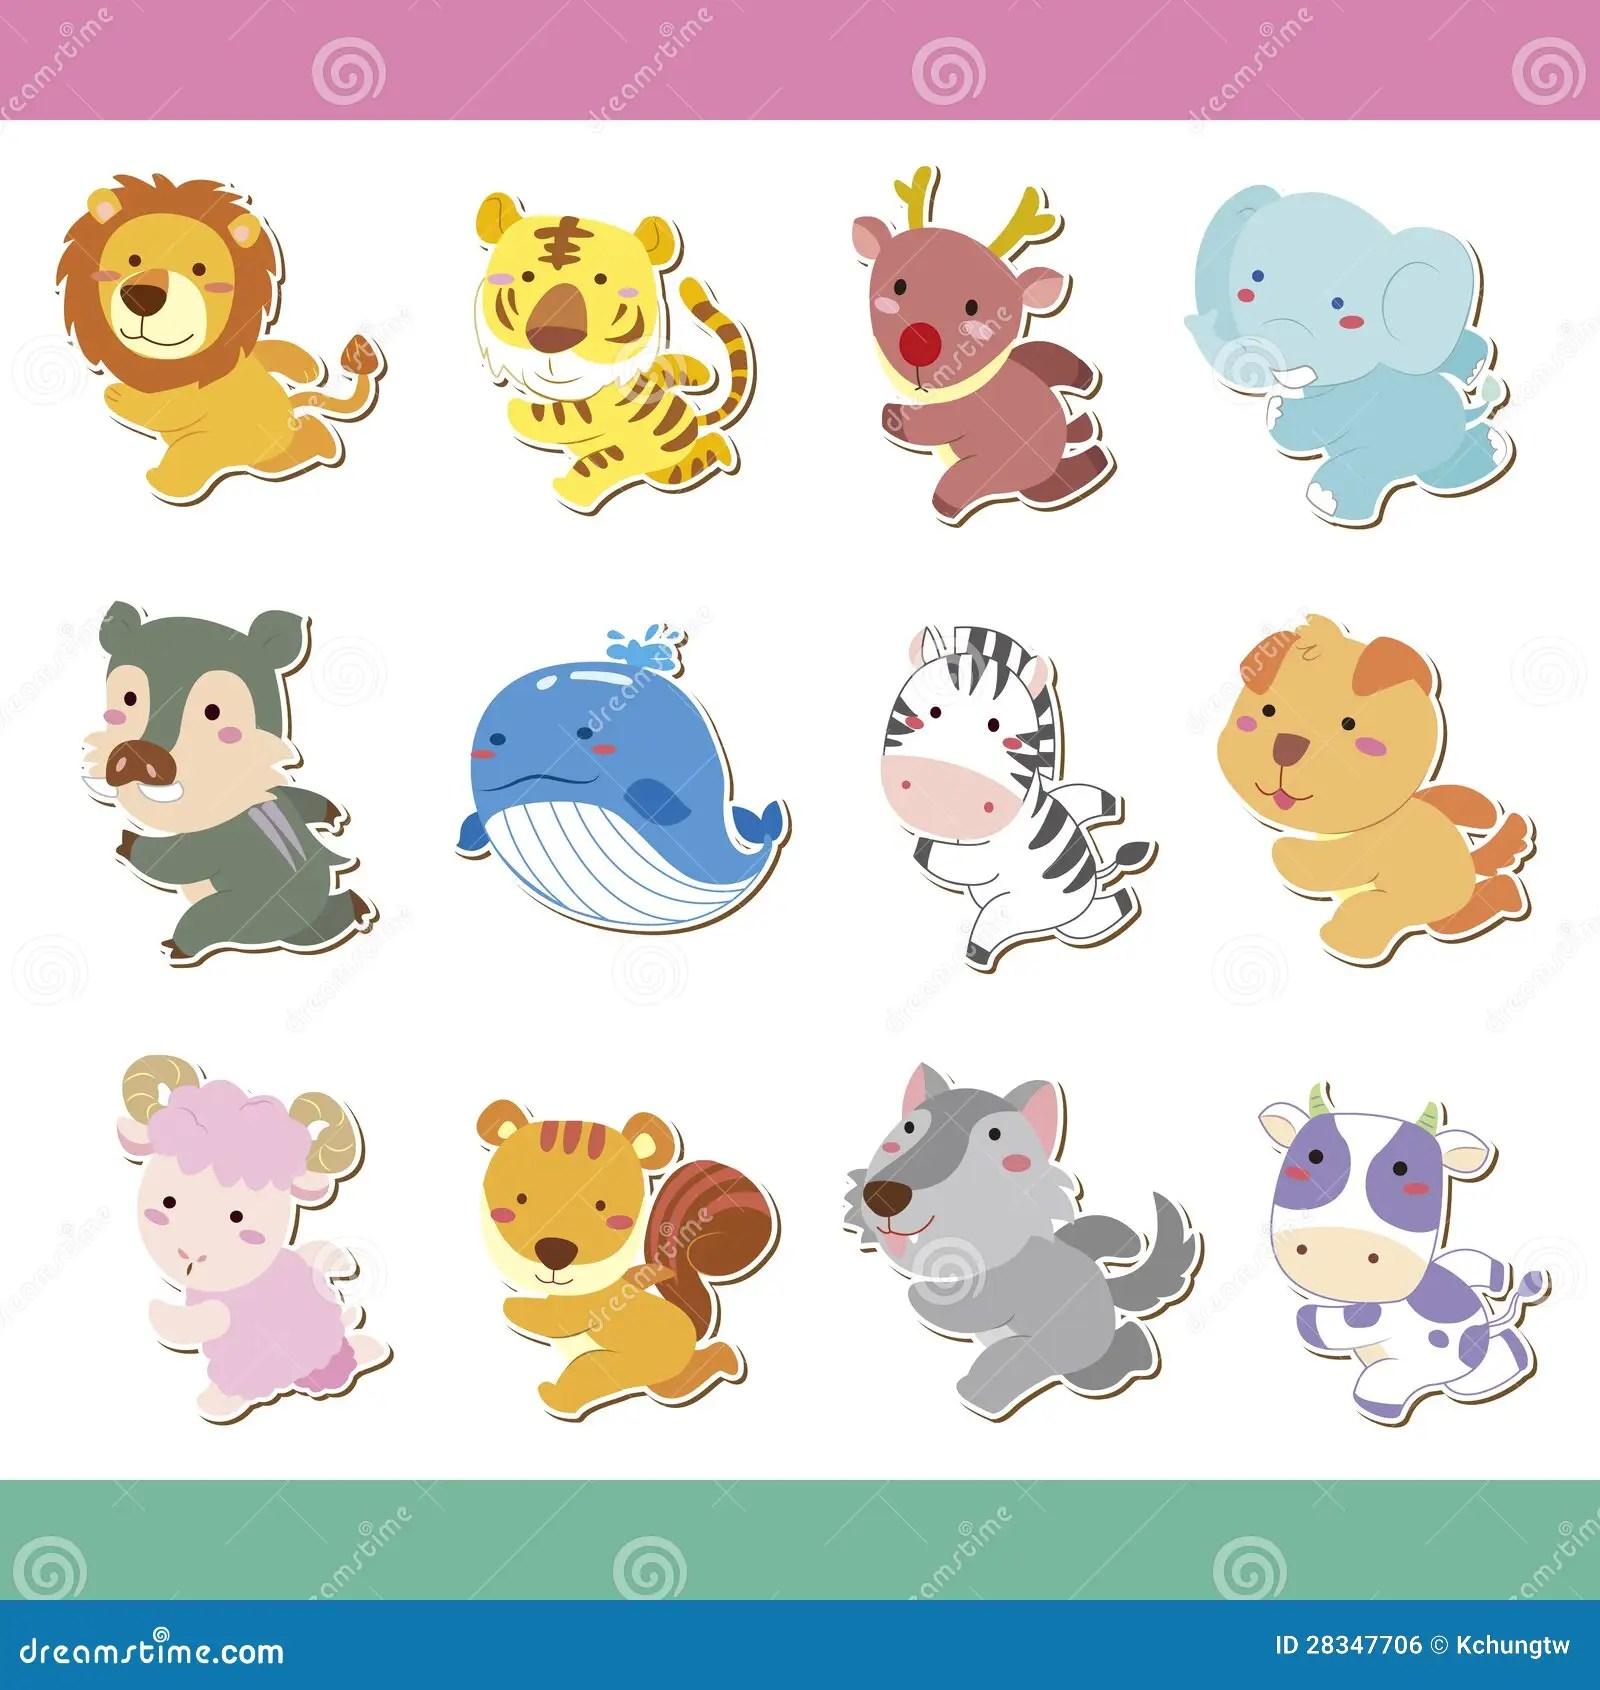 Cute Cartoon Animal Icon Set Royalty Free Stock Image